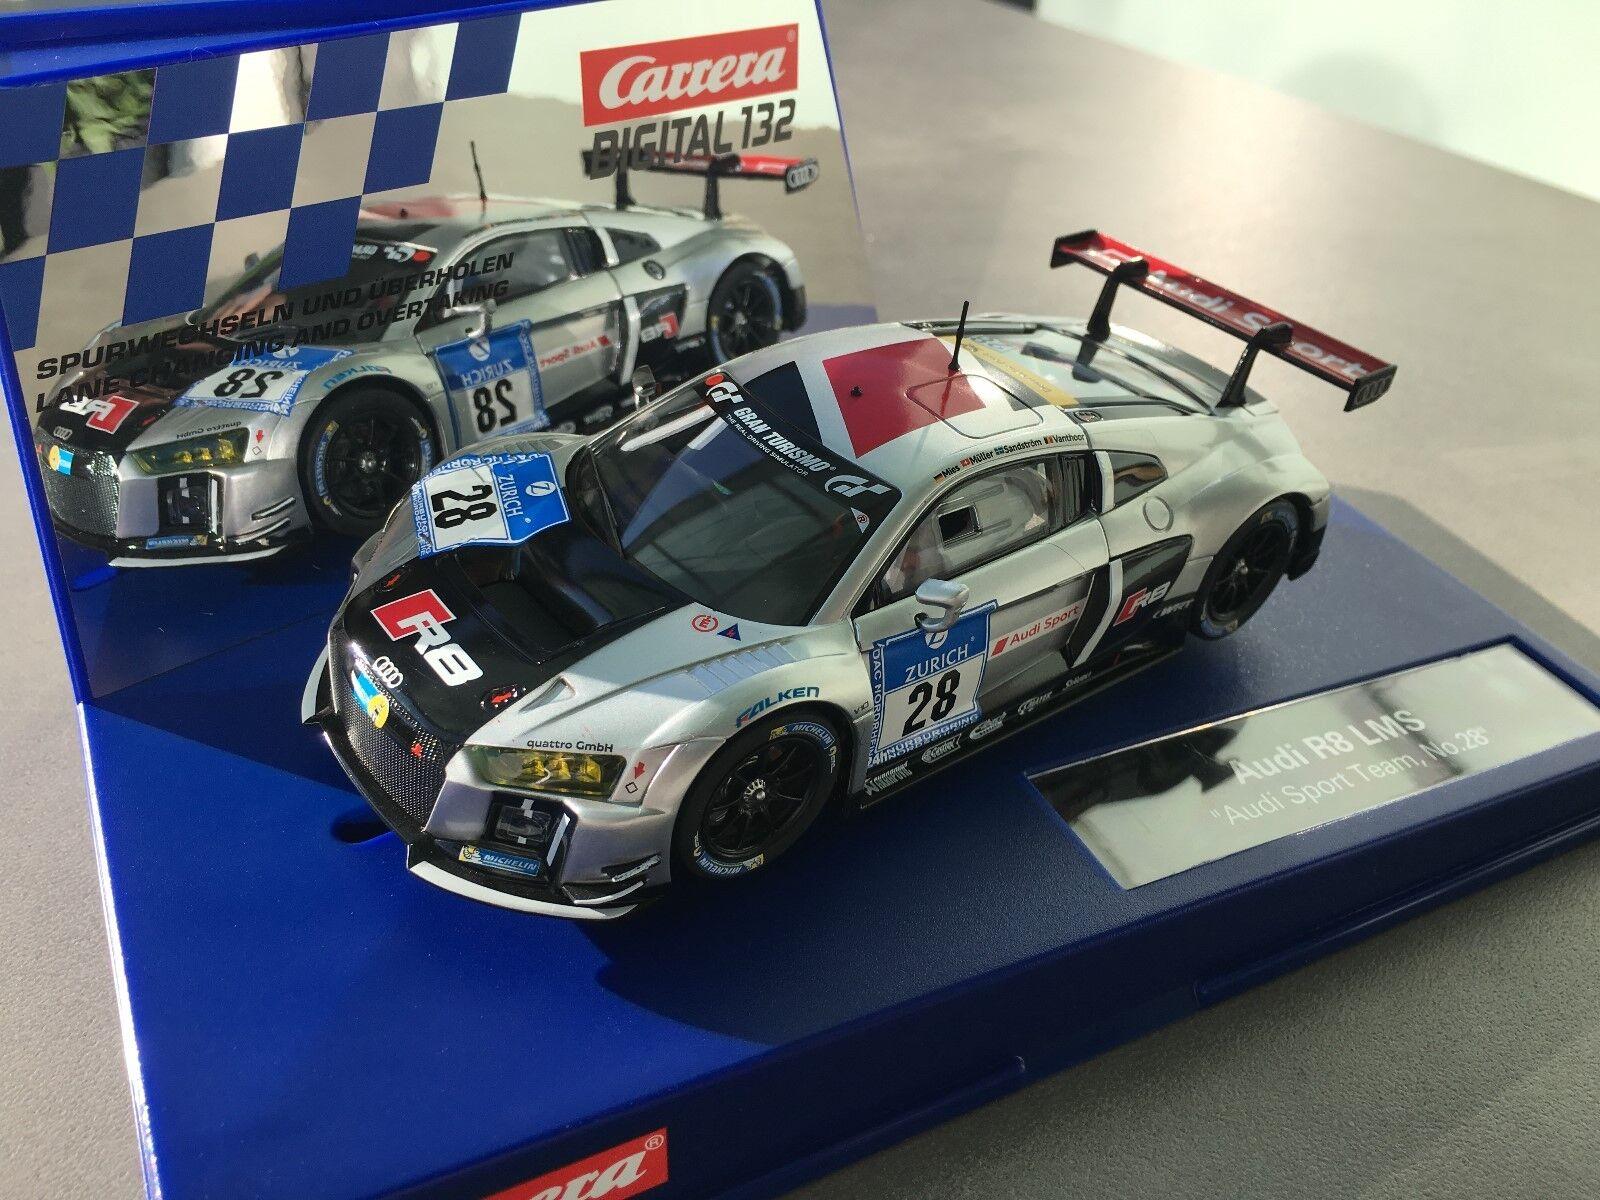 Carrera Digital 132 30769 Audi R6 LMS  Audi Sport Team, No.28  NEU OVP  | Verschiedene aktuelle Designs